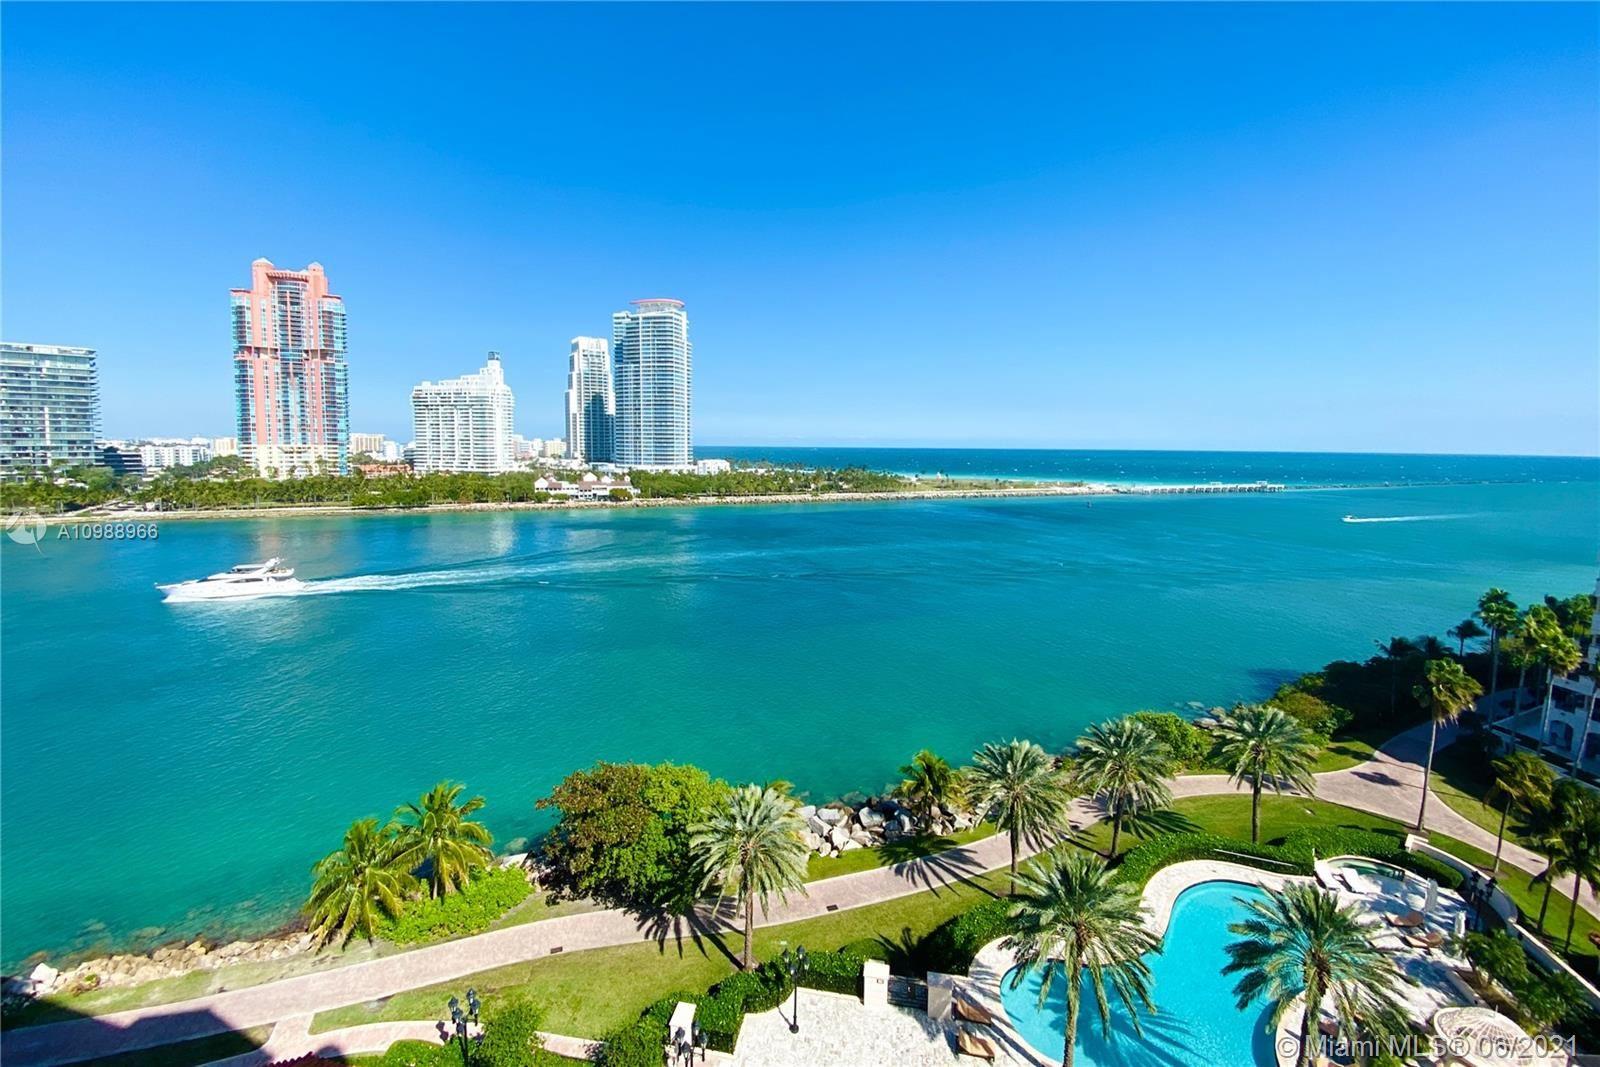 Photo of 7192 Fisher Island Dr #7192, Miami Beach, FL 33109 (MLS # A10988966)